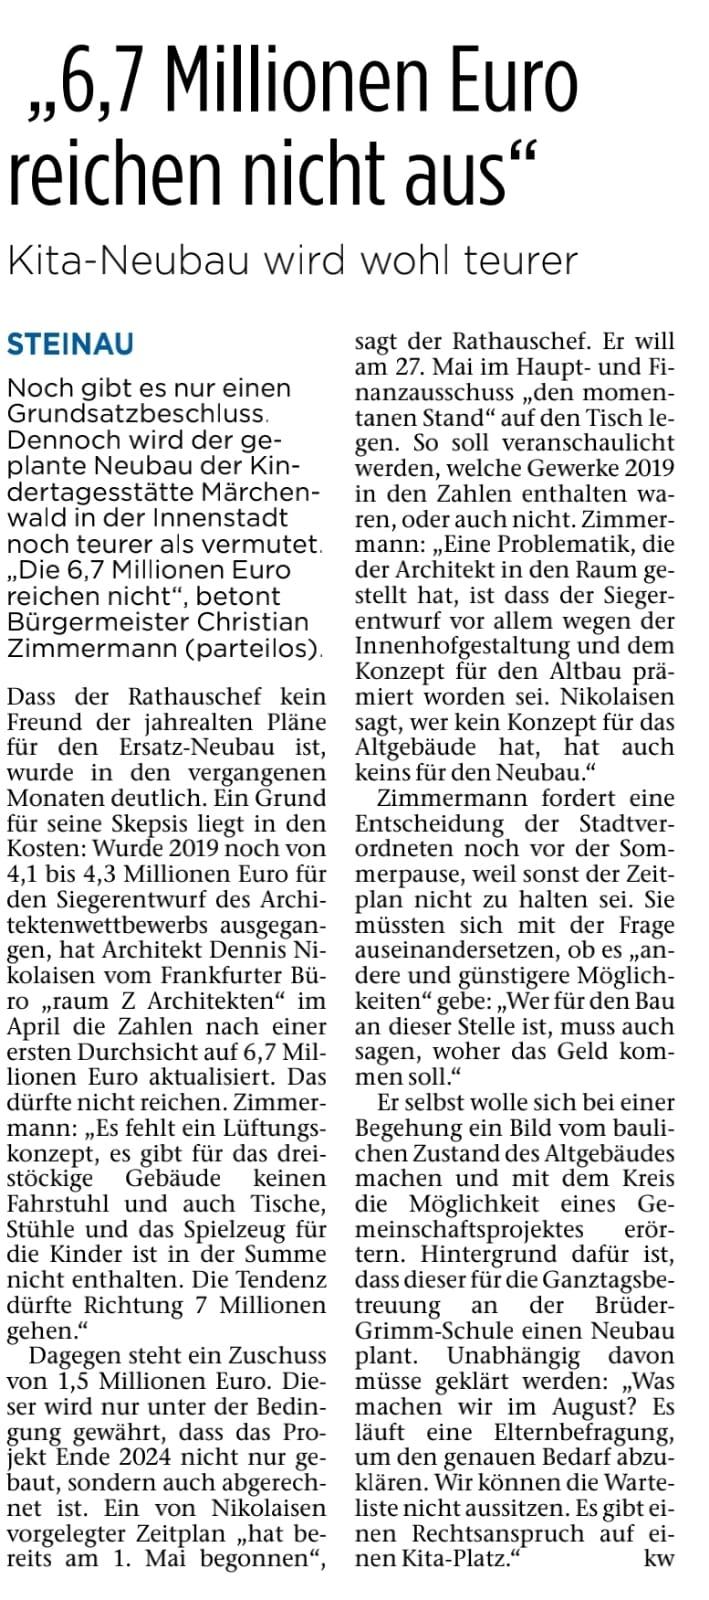 18.05.2021 - Bergwinkel Wochenbote